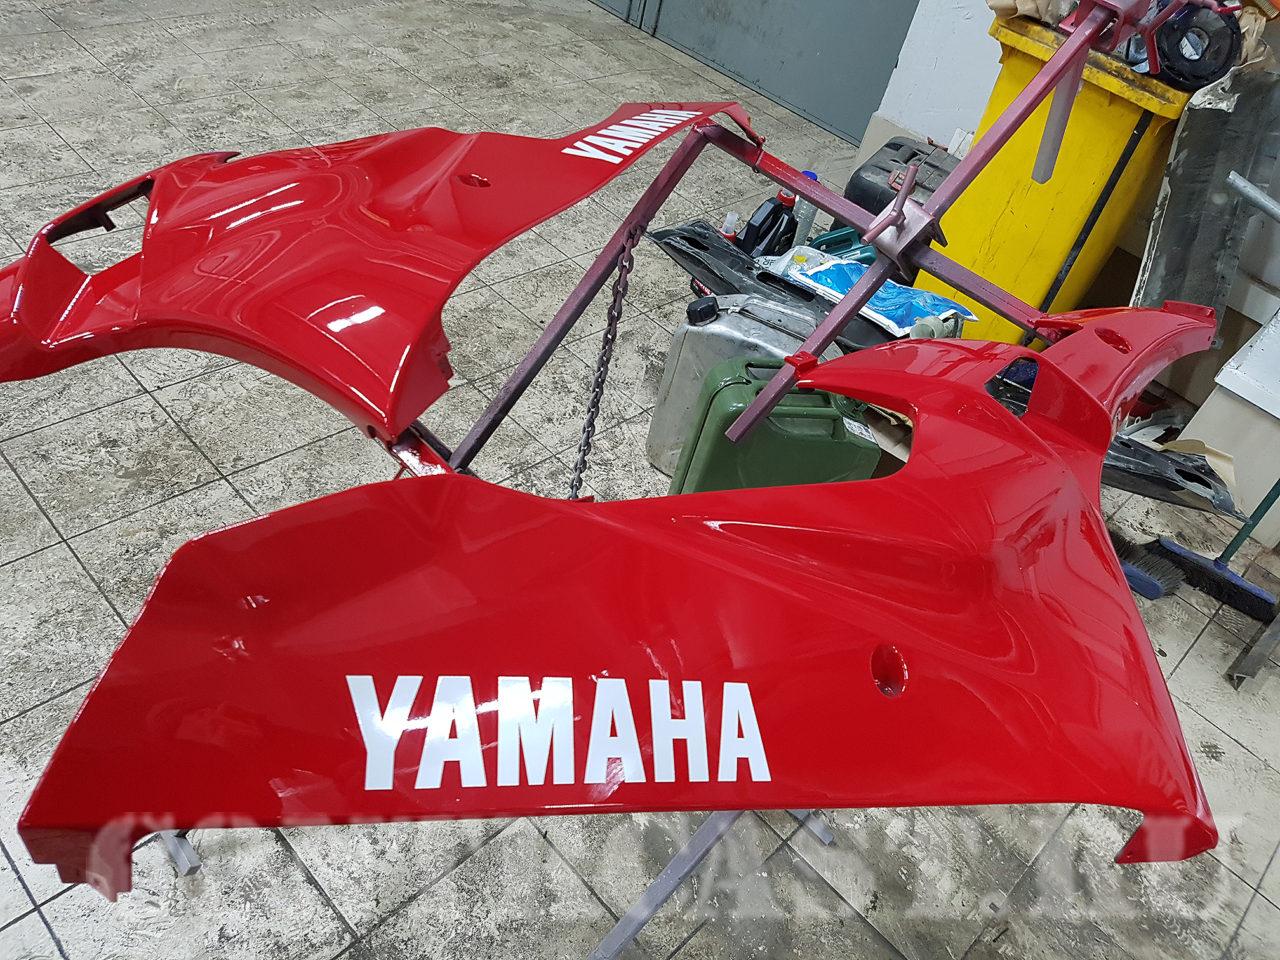 sticker on motorcycle YAMAHA R1